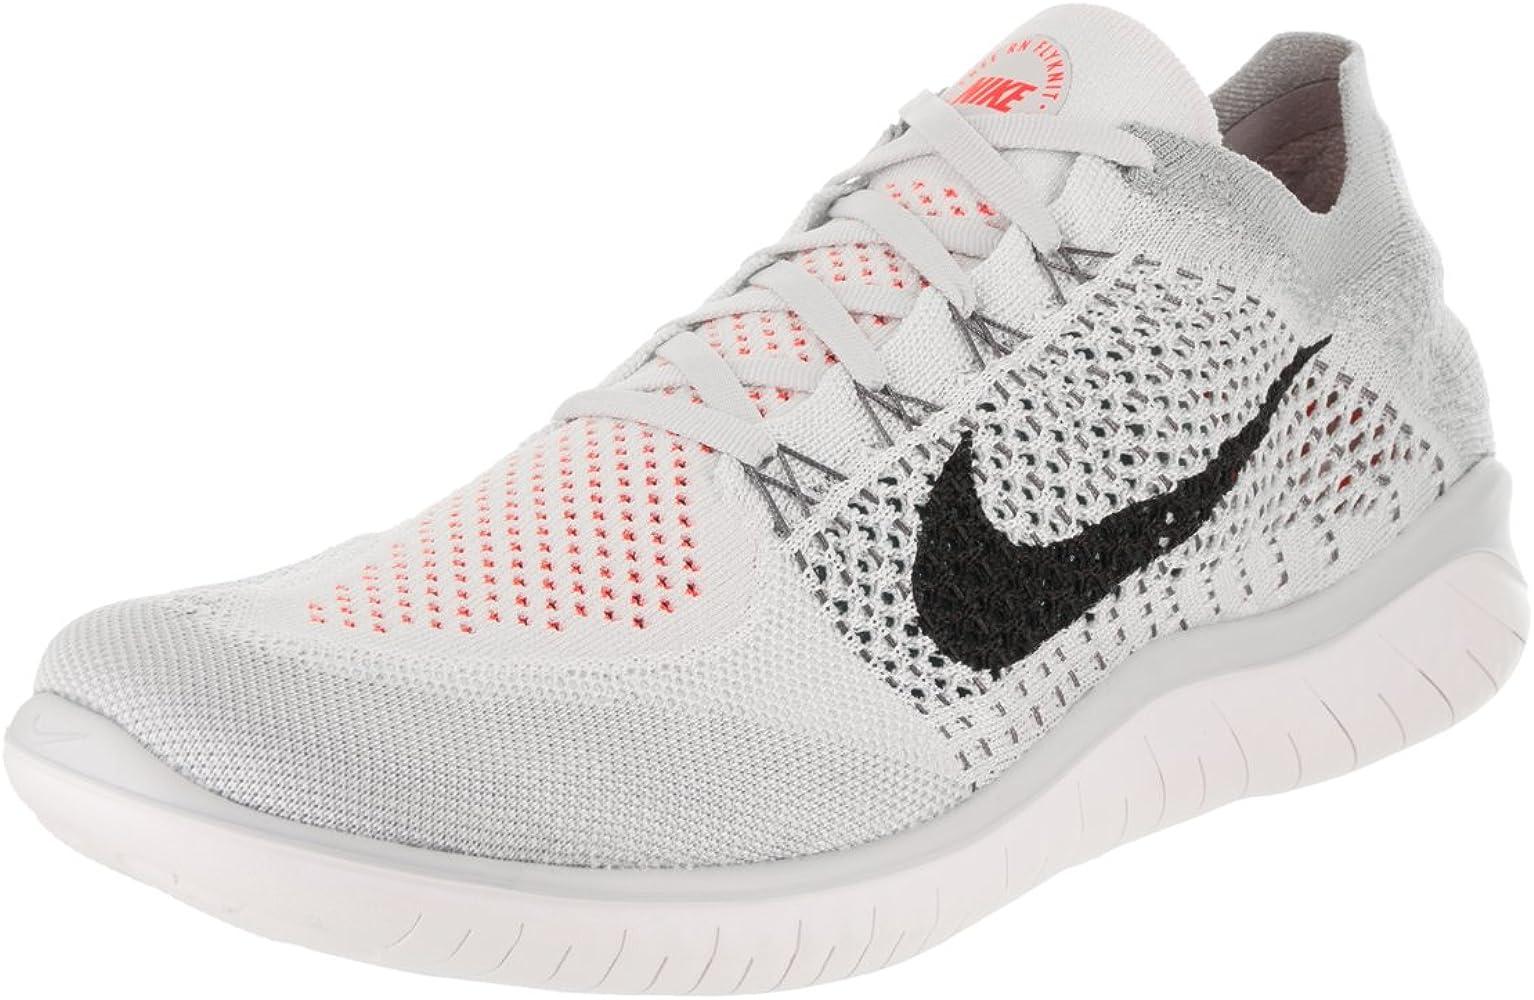 Nike Herren Laufschuh Free Run Flyknit 2018, Zapatillas de Running ...